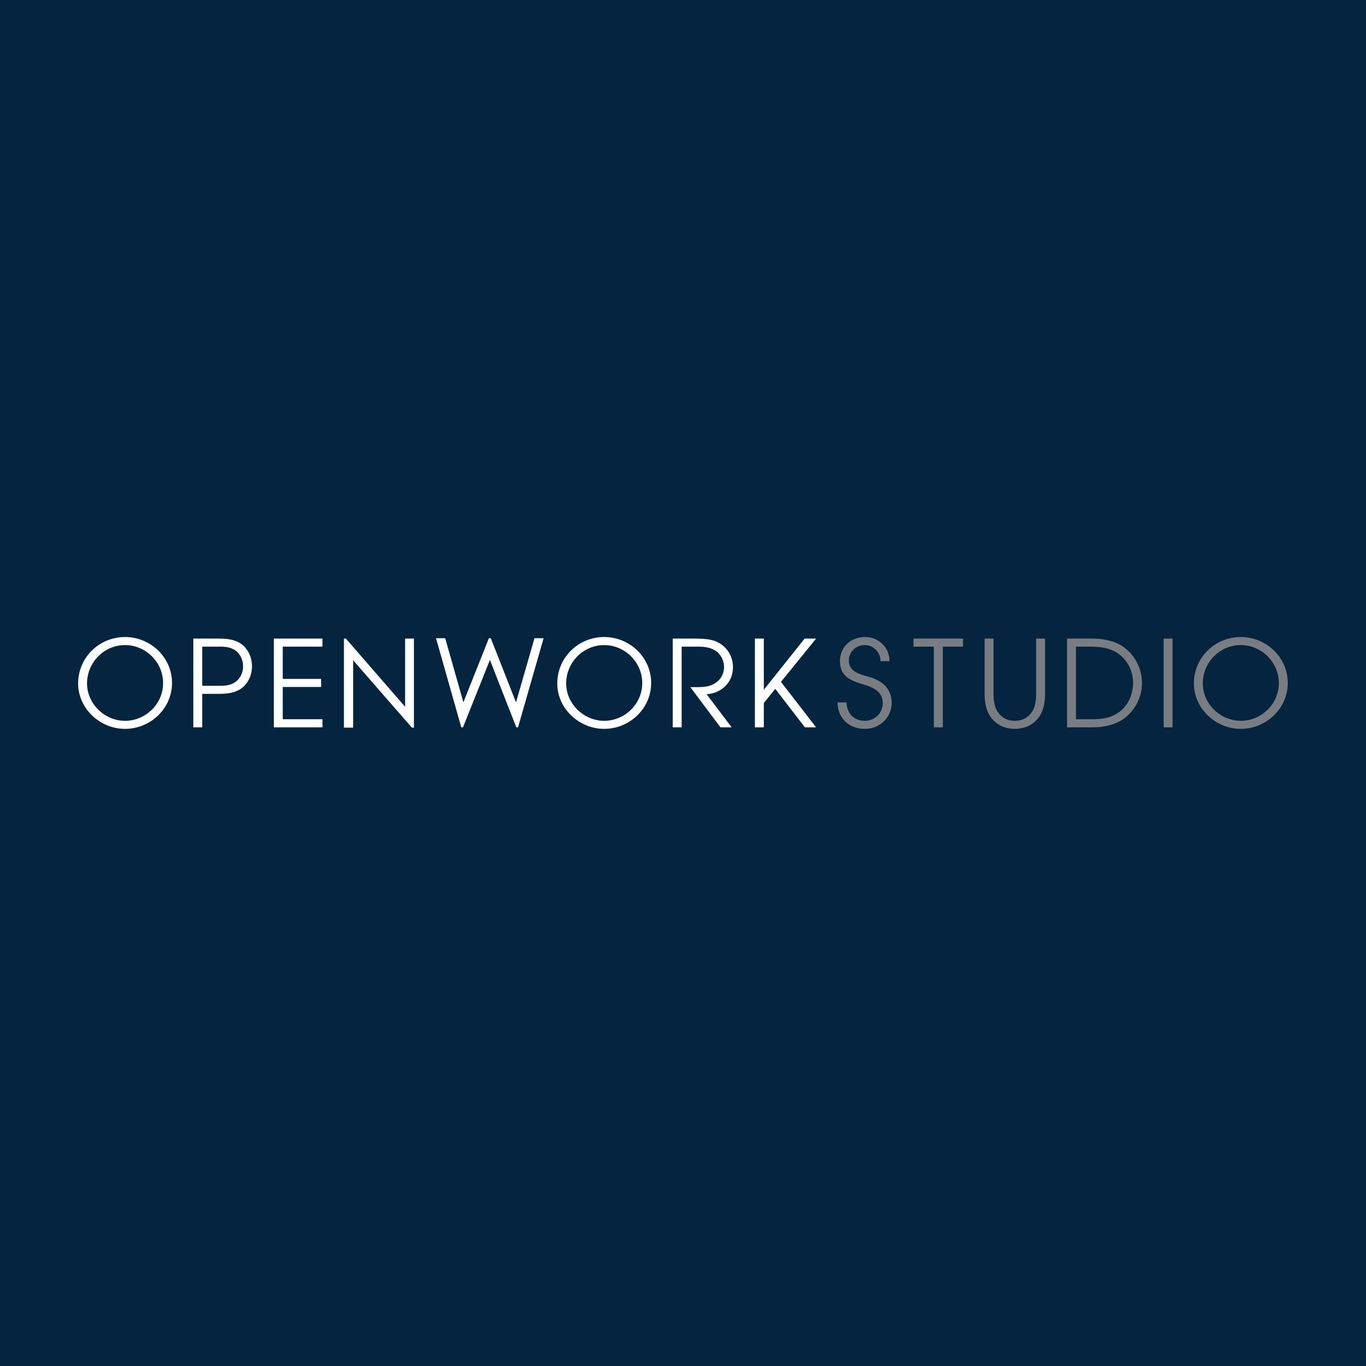 openworkstudio architecture logo Malta